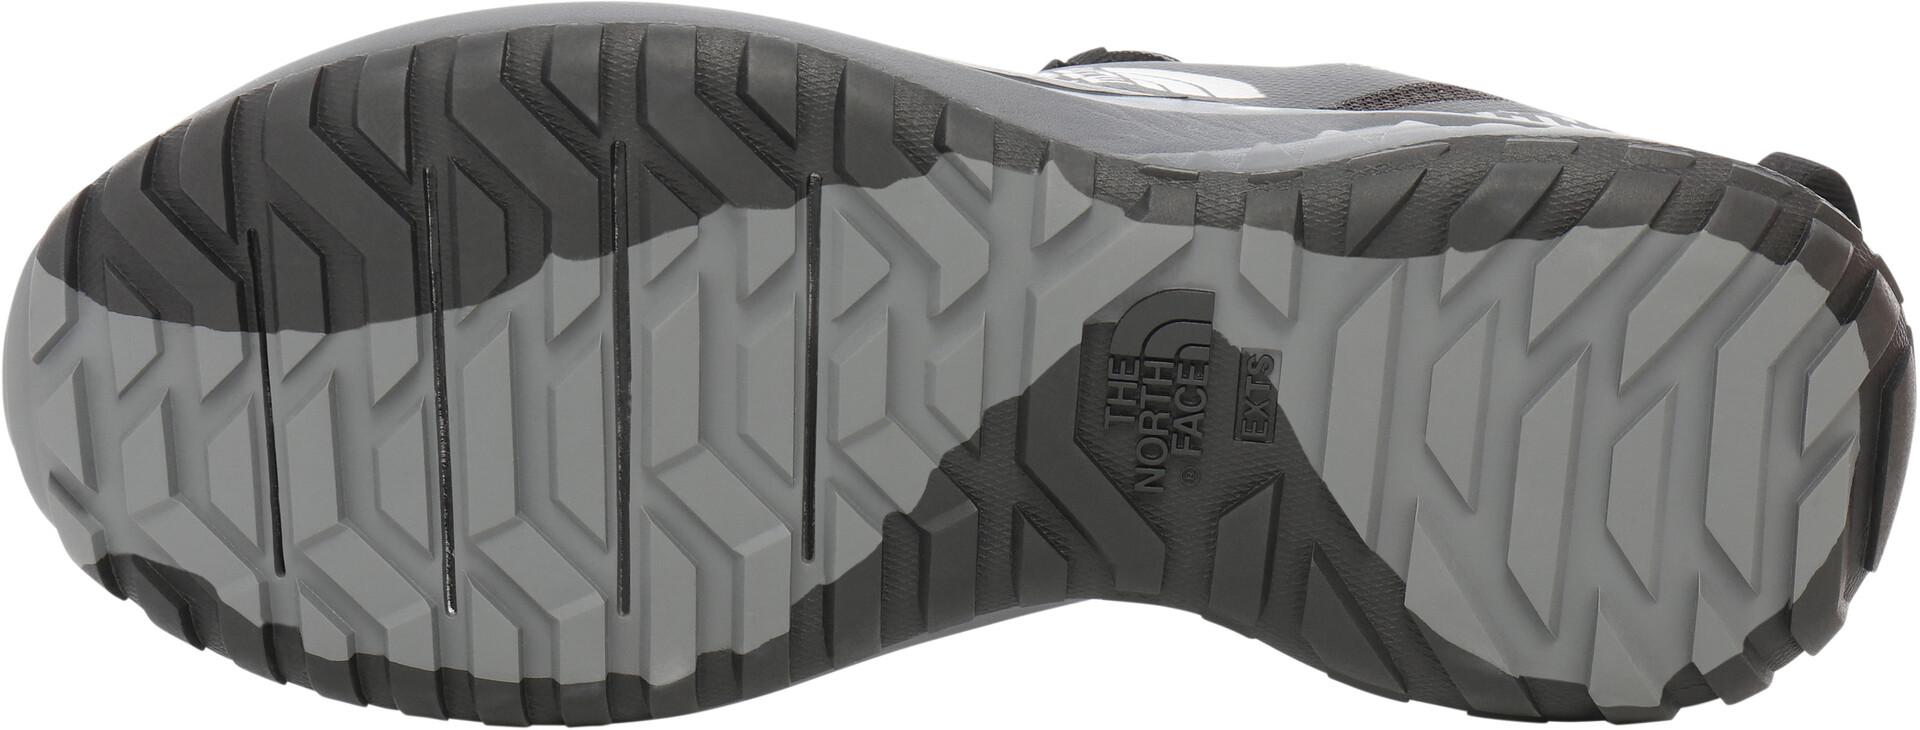 The North Face Ultra Endurance XF FutureLight Sko Herrer, tnf blackzinc grey